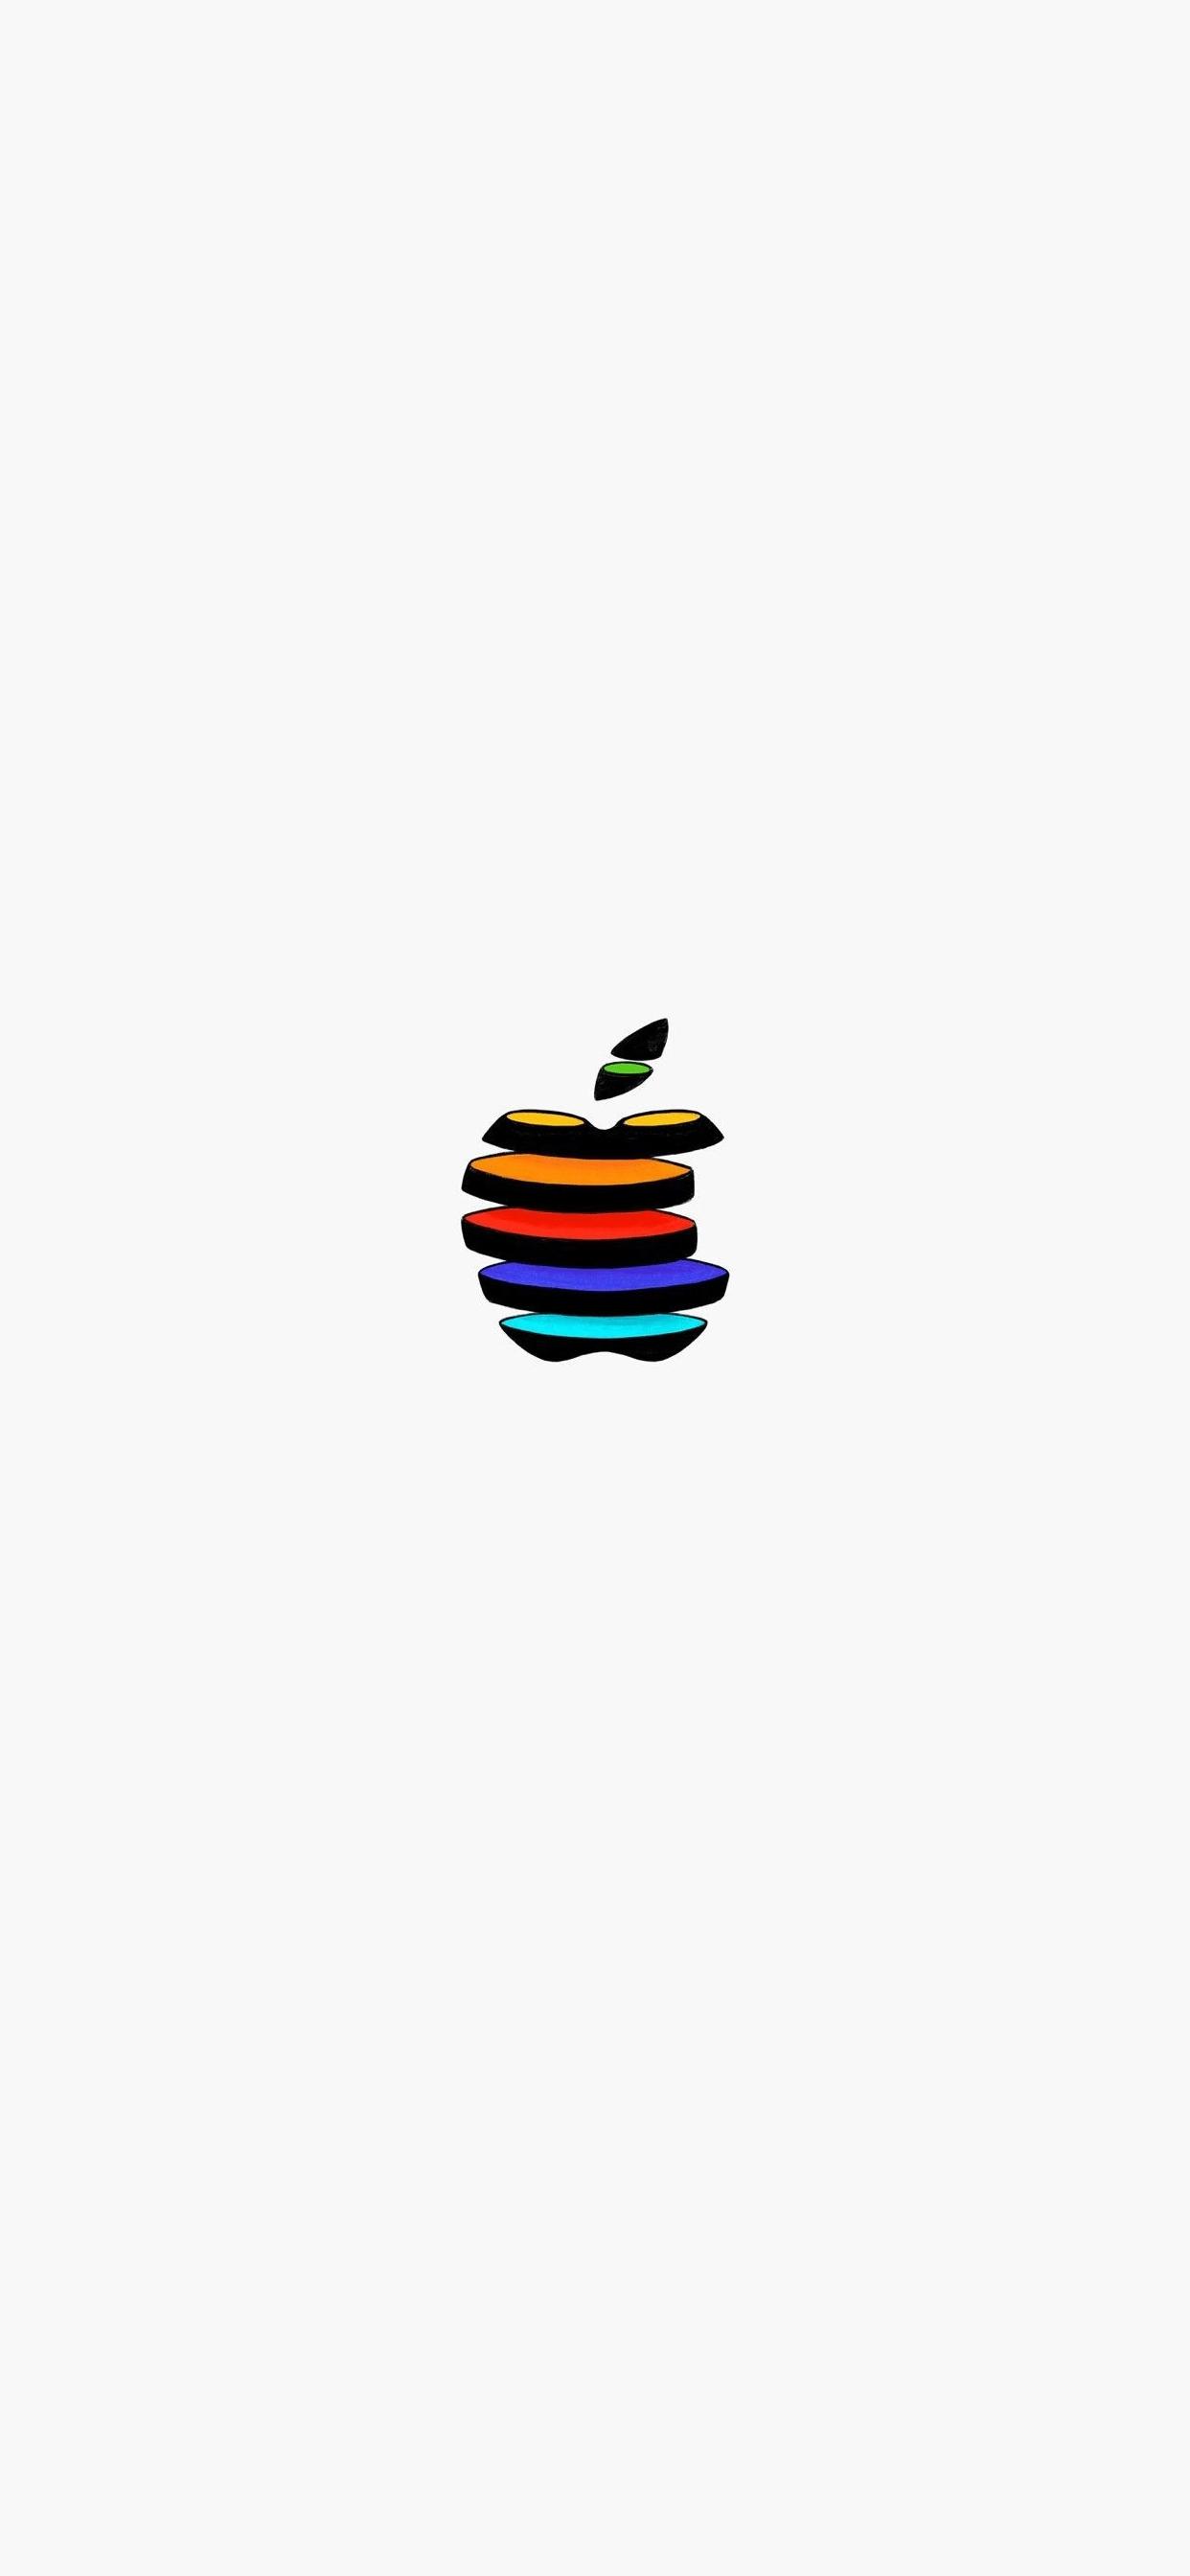 16 Apple logo